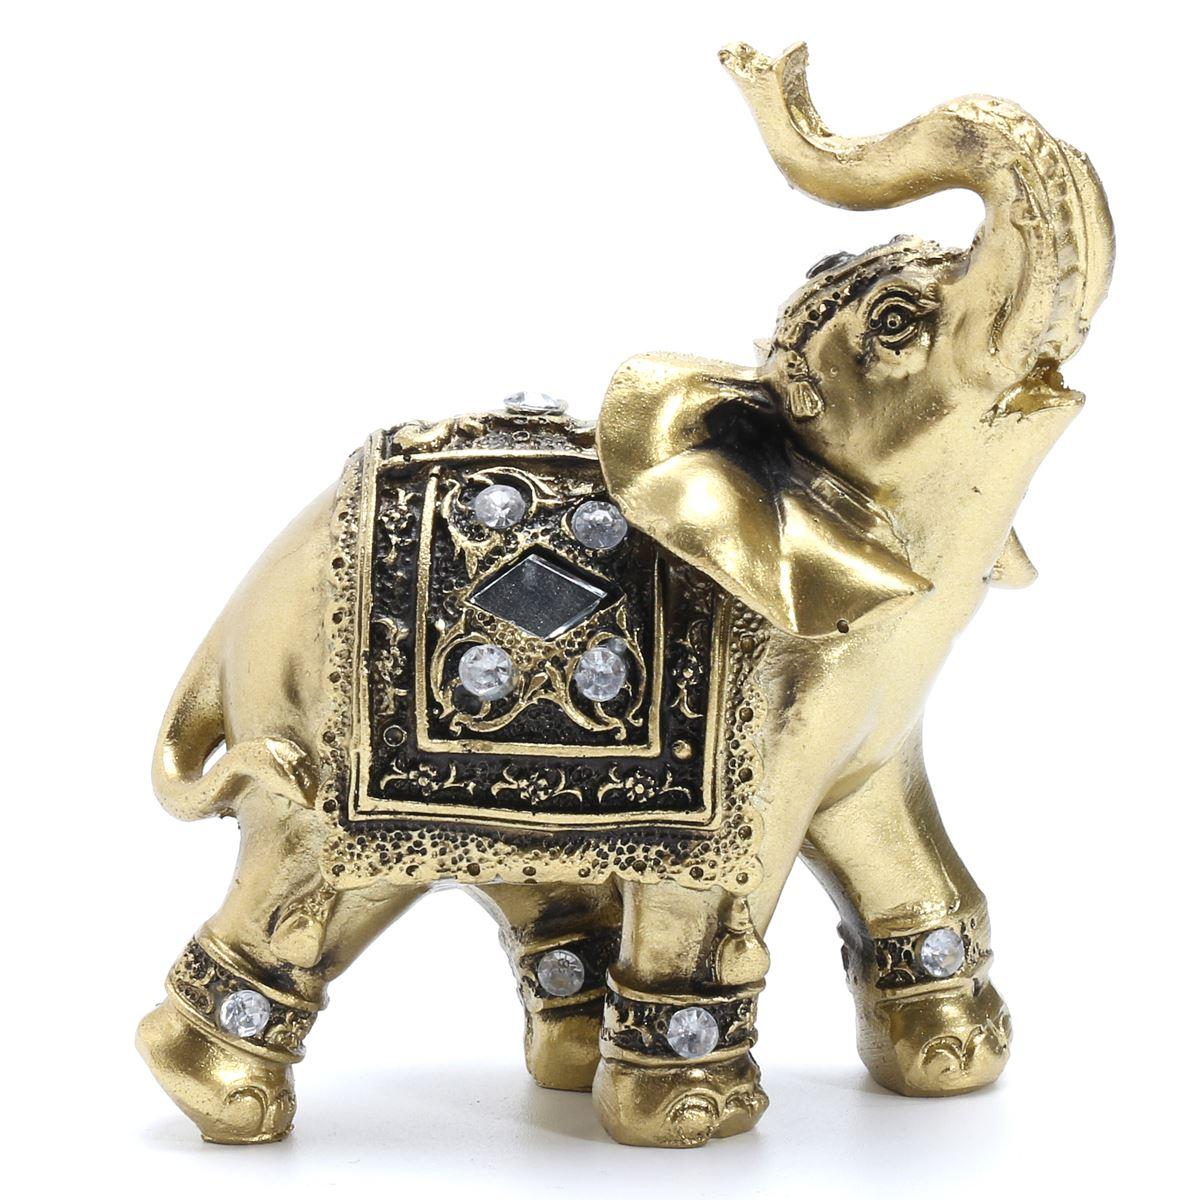 elefante estatua riqueza suerte cm figuras decorativas de resina elefante con diamante souvenir